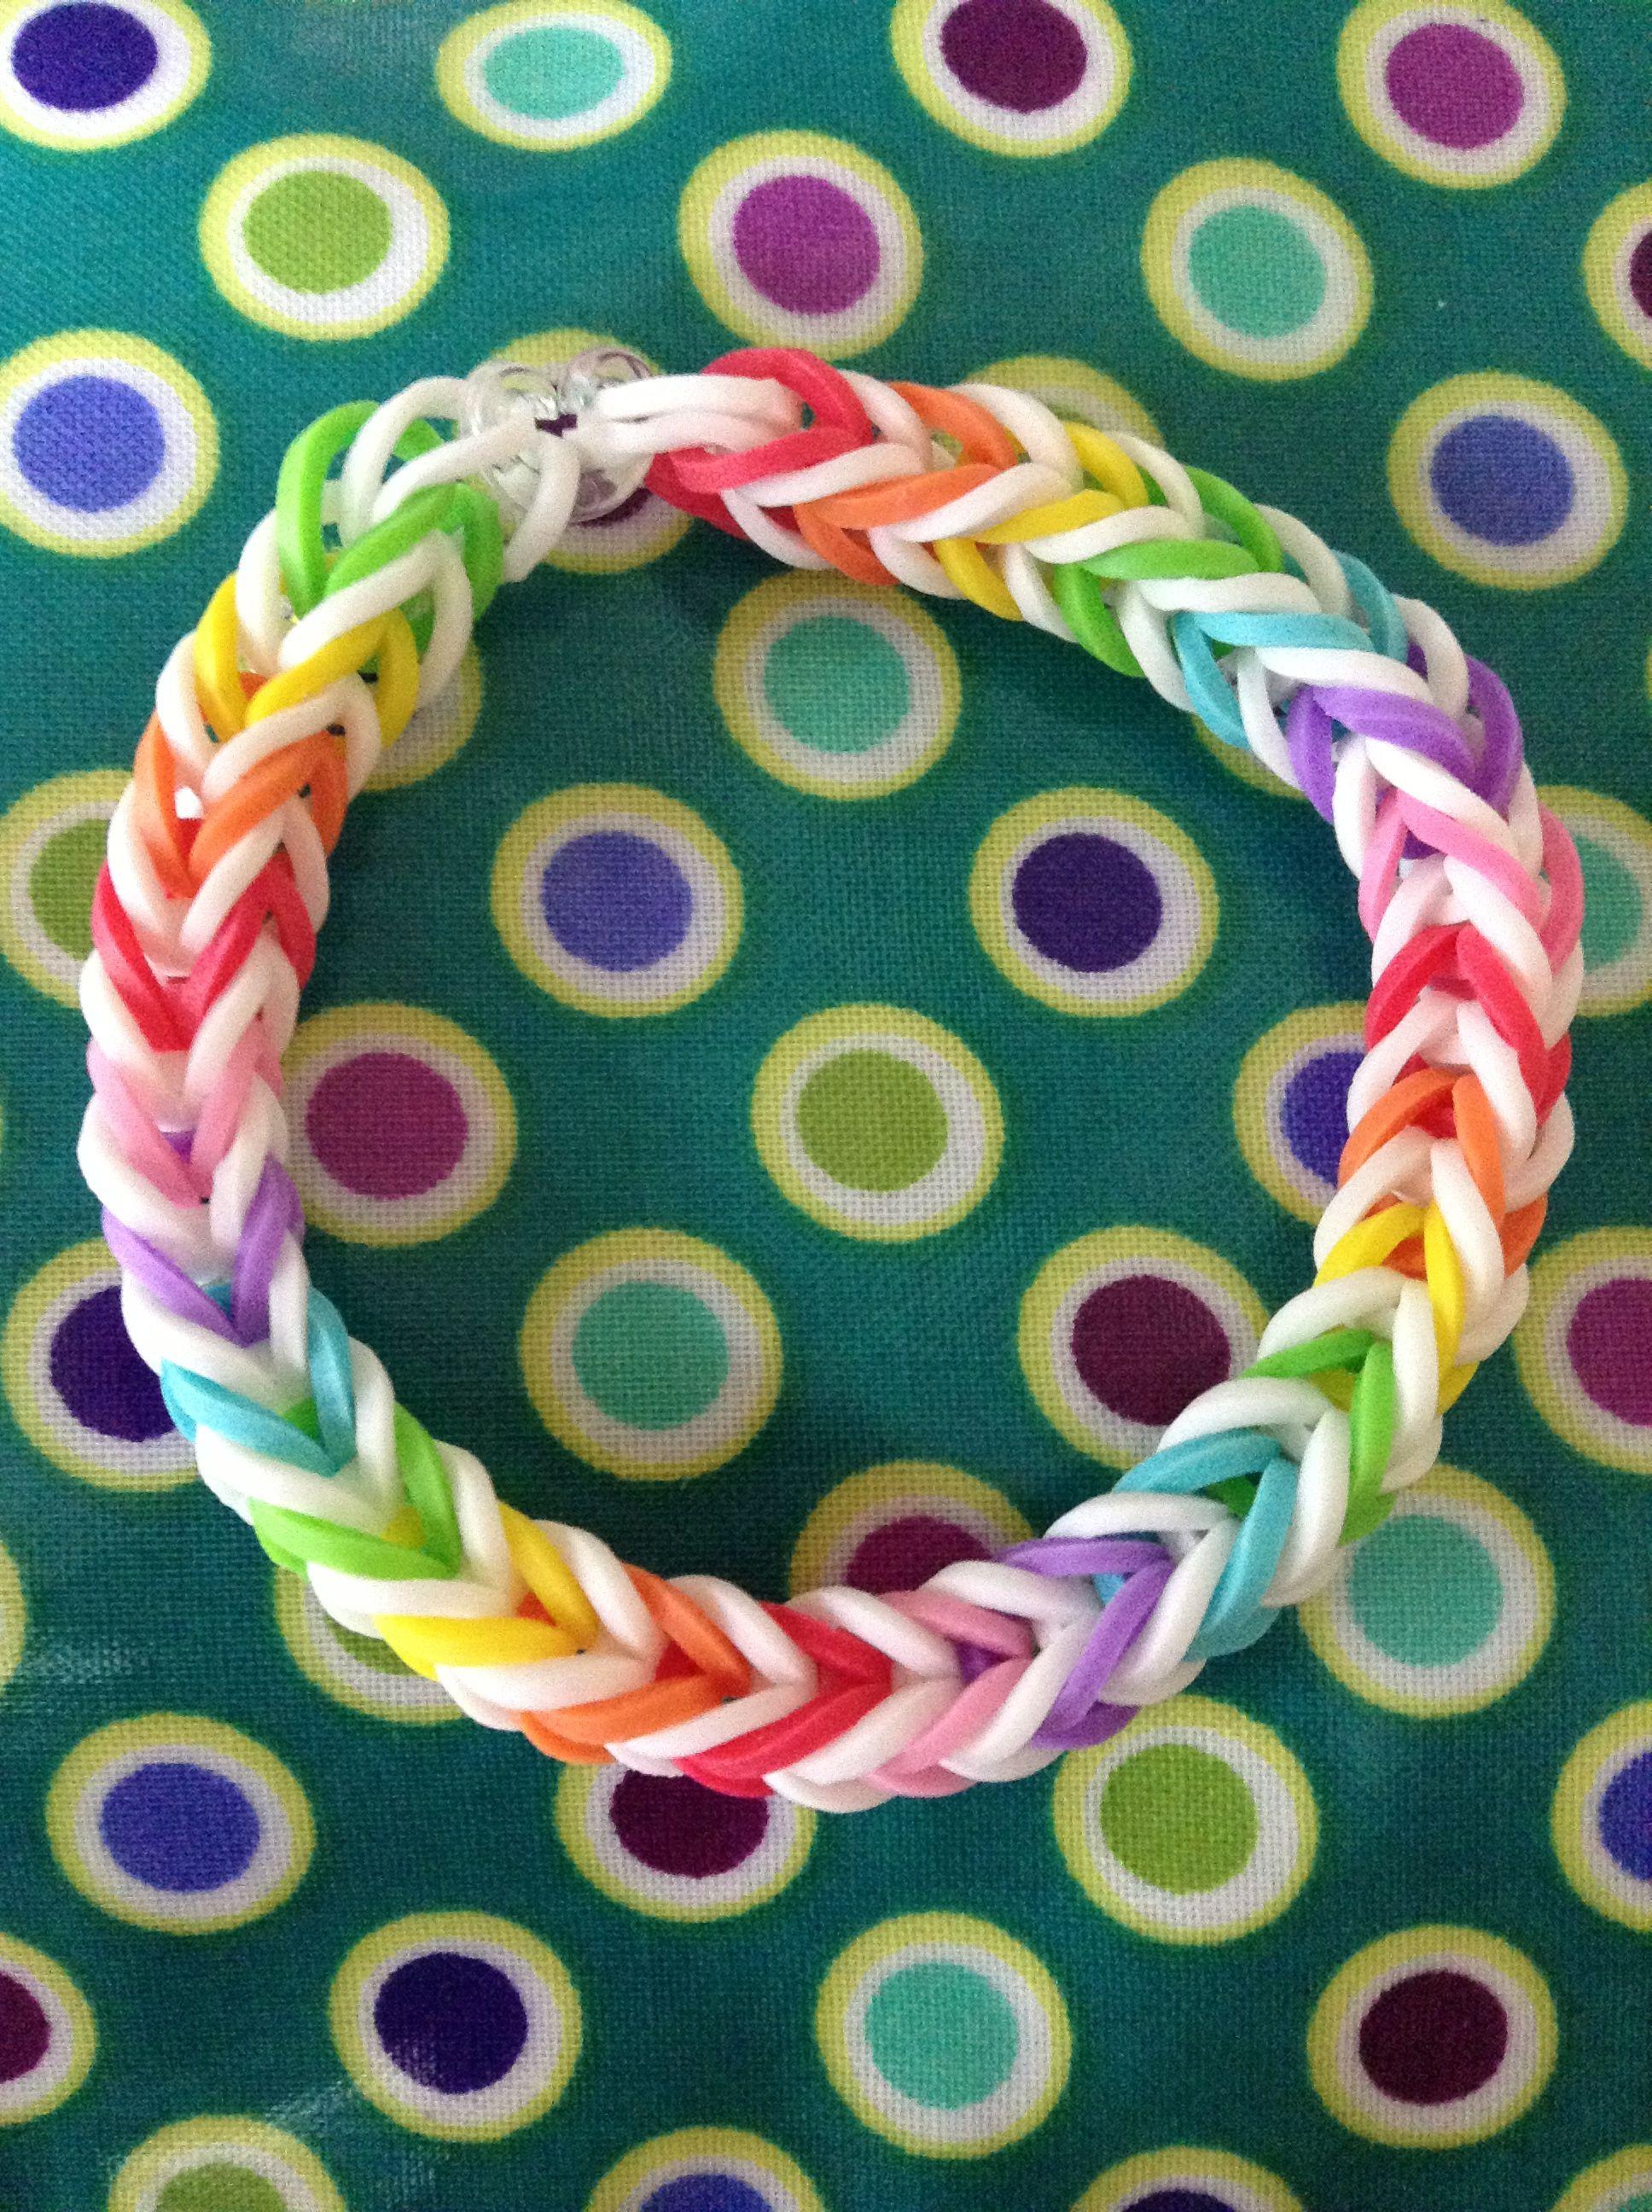 Rainbow And White Rainbow Loom Rubber Band Bracelet Rainbow Loom